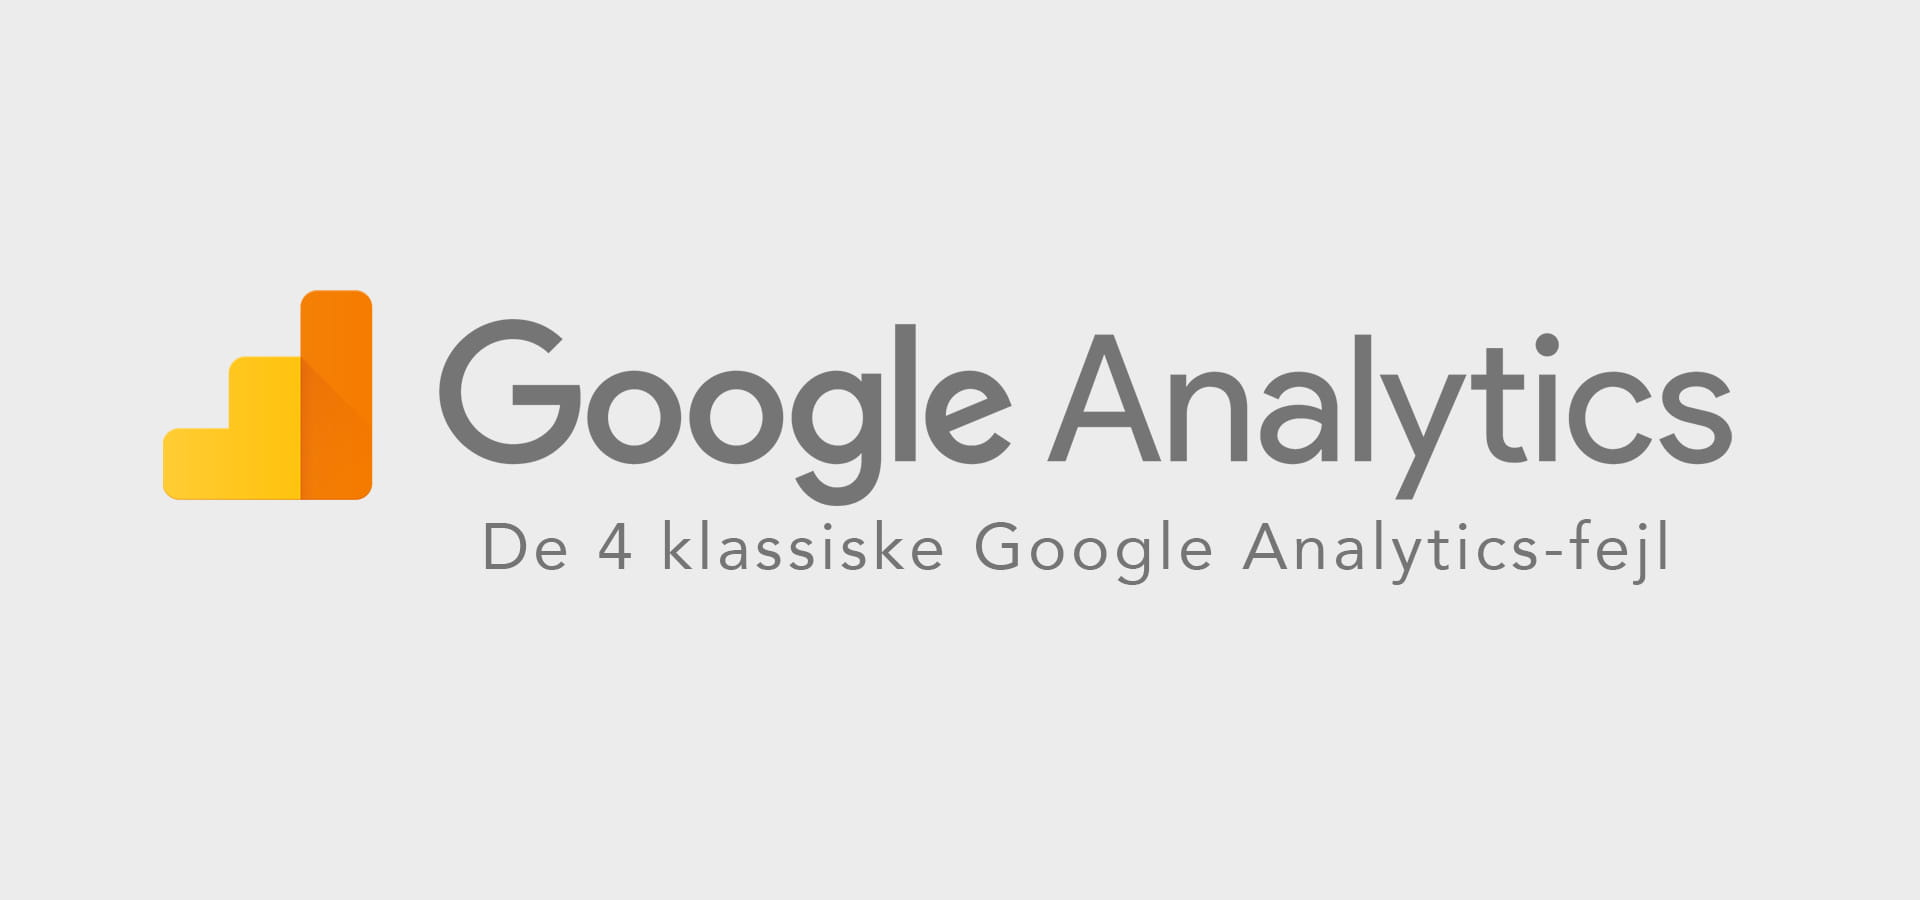 4 almindelige fejl i Google Analytics